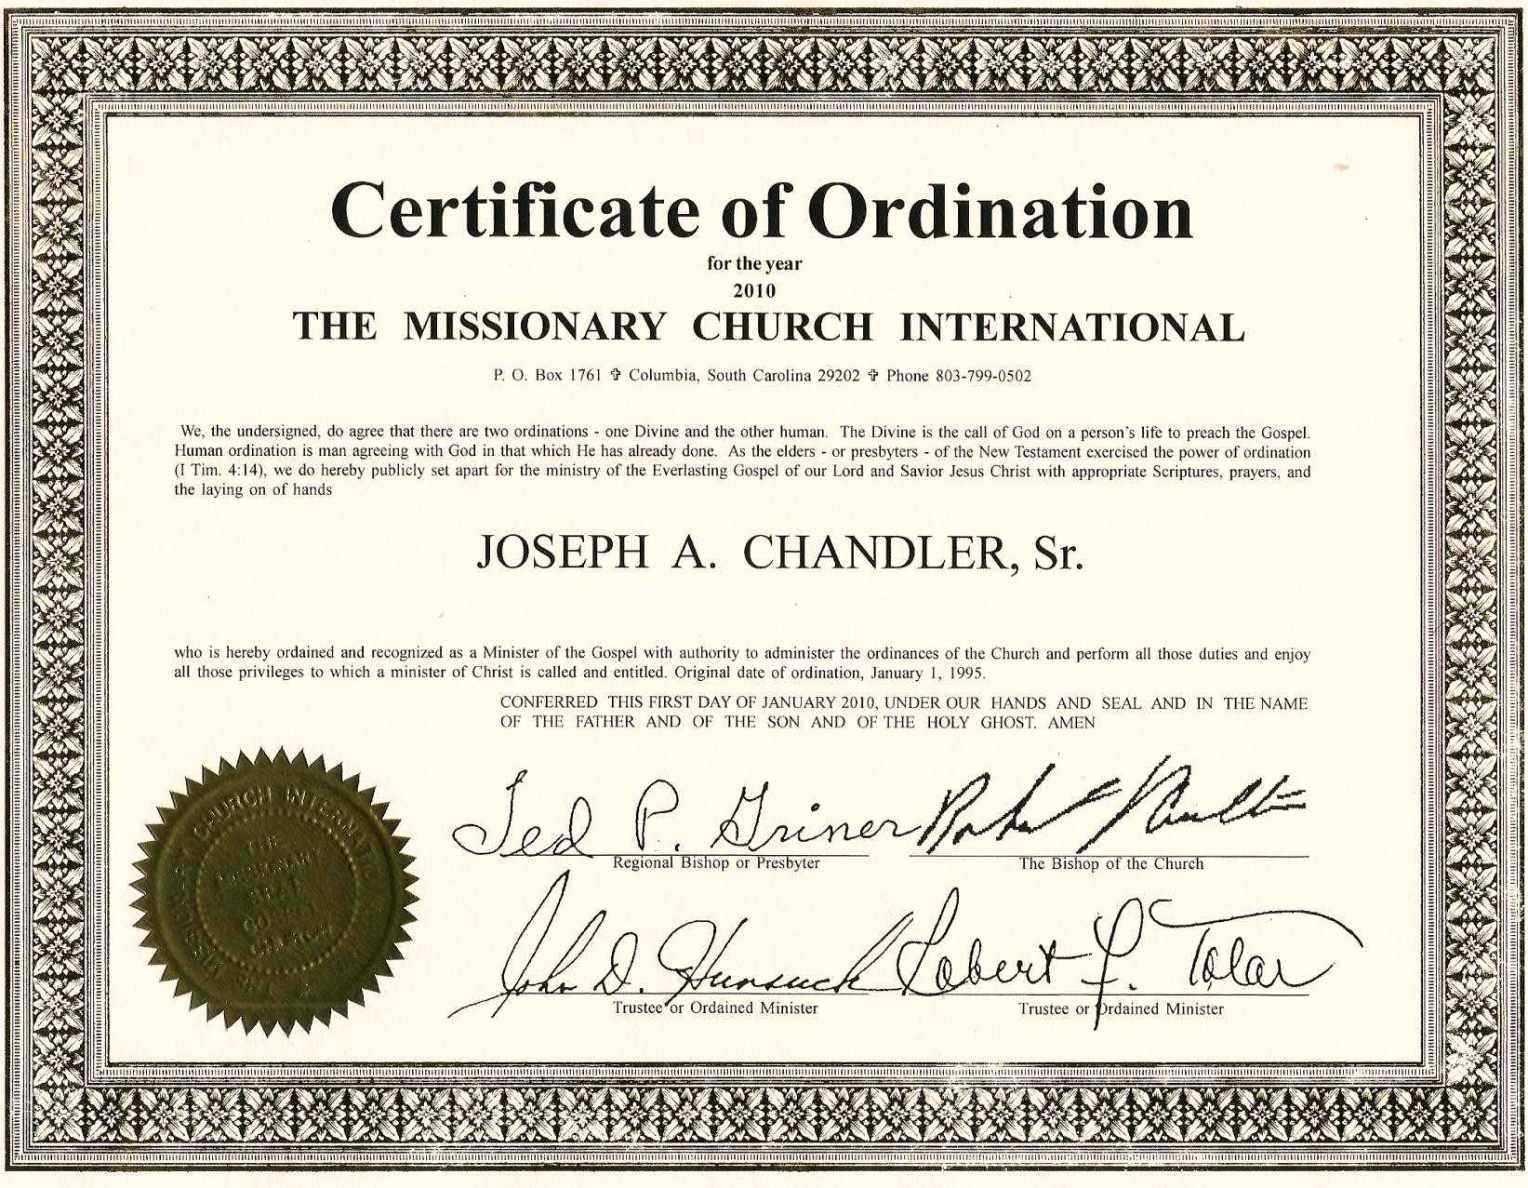 Free Ordination Certificate Template - Great Professional Regarding Ordination Certificate Template